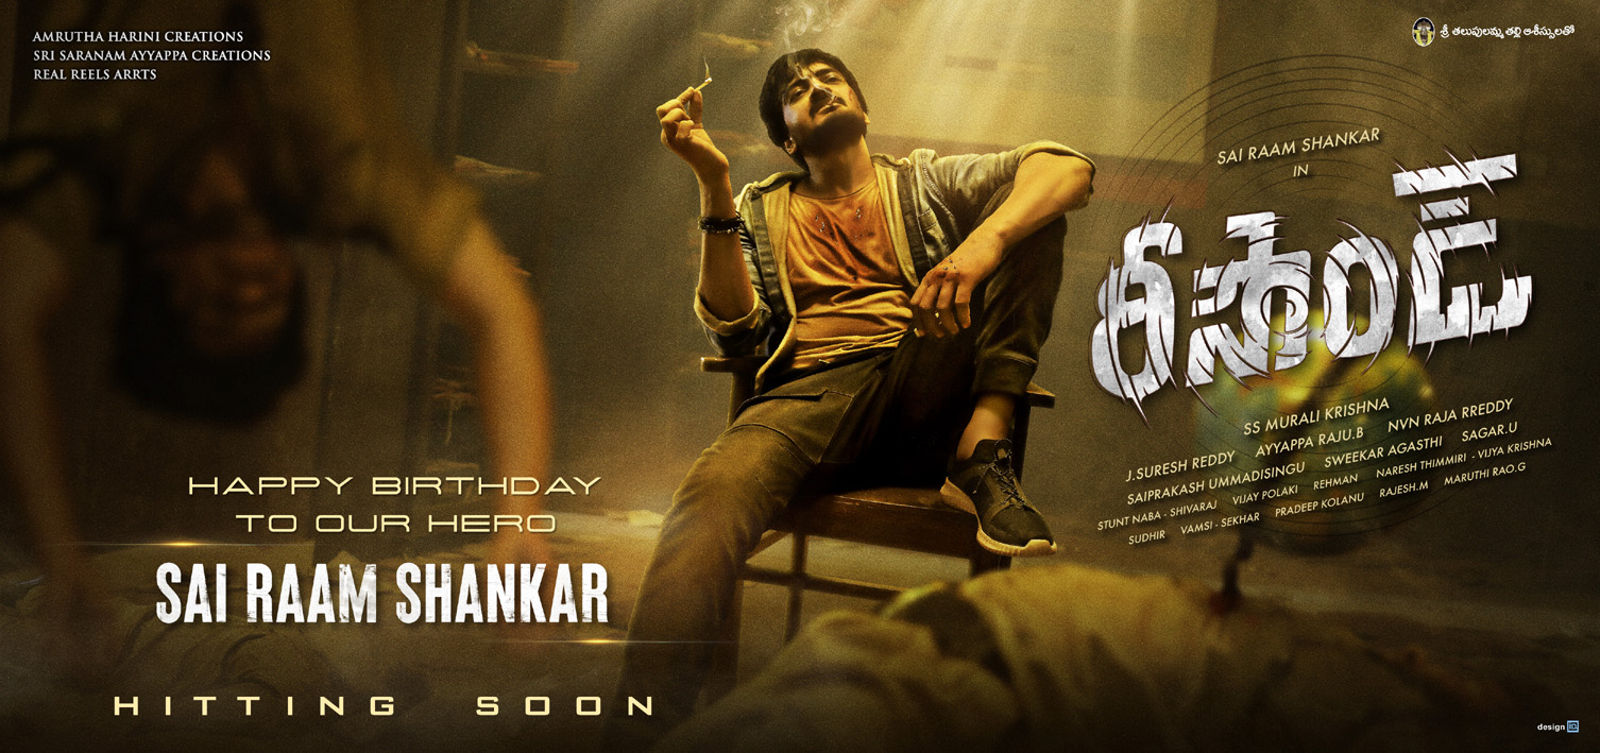 Actor Sai Raam Shankar Resound First Look Poster HD